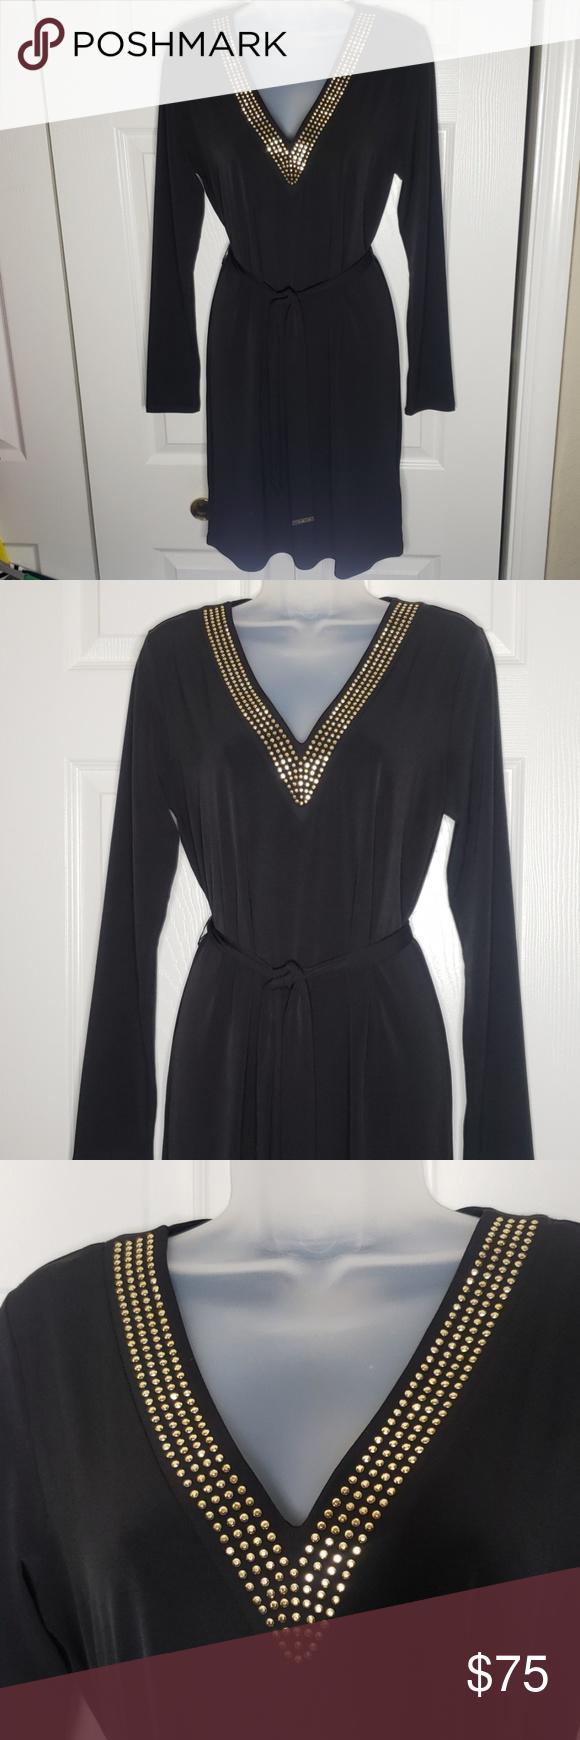 Pin By Rickety Rack On Little Black Dress Obsessed Warrior Dress Black Short Dress Sequin Cocktail Dress [ 1235 x 820 Pixel ]